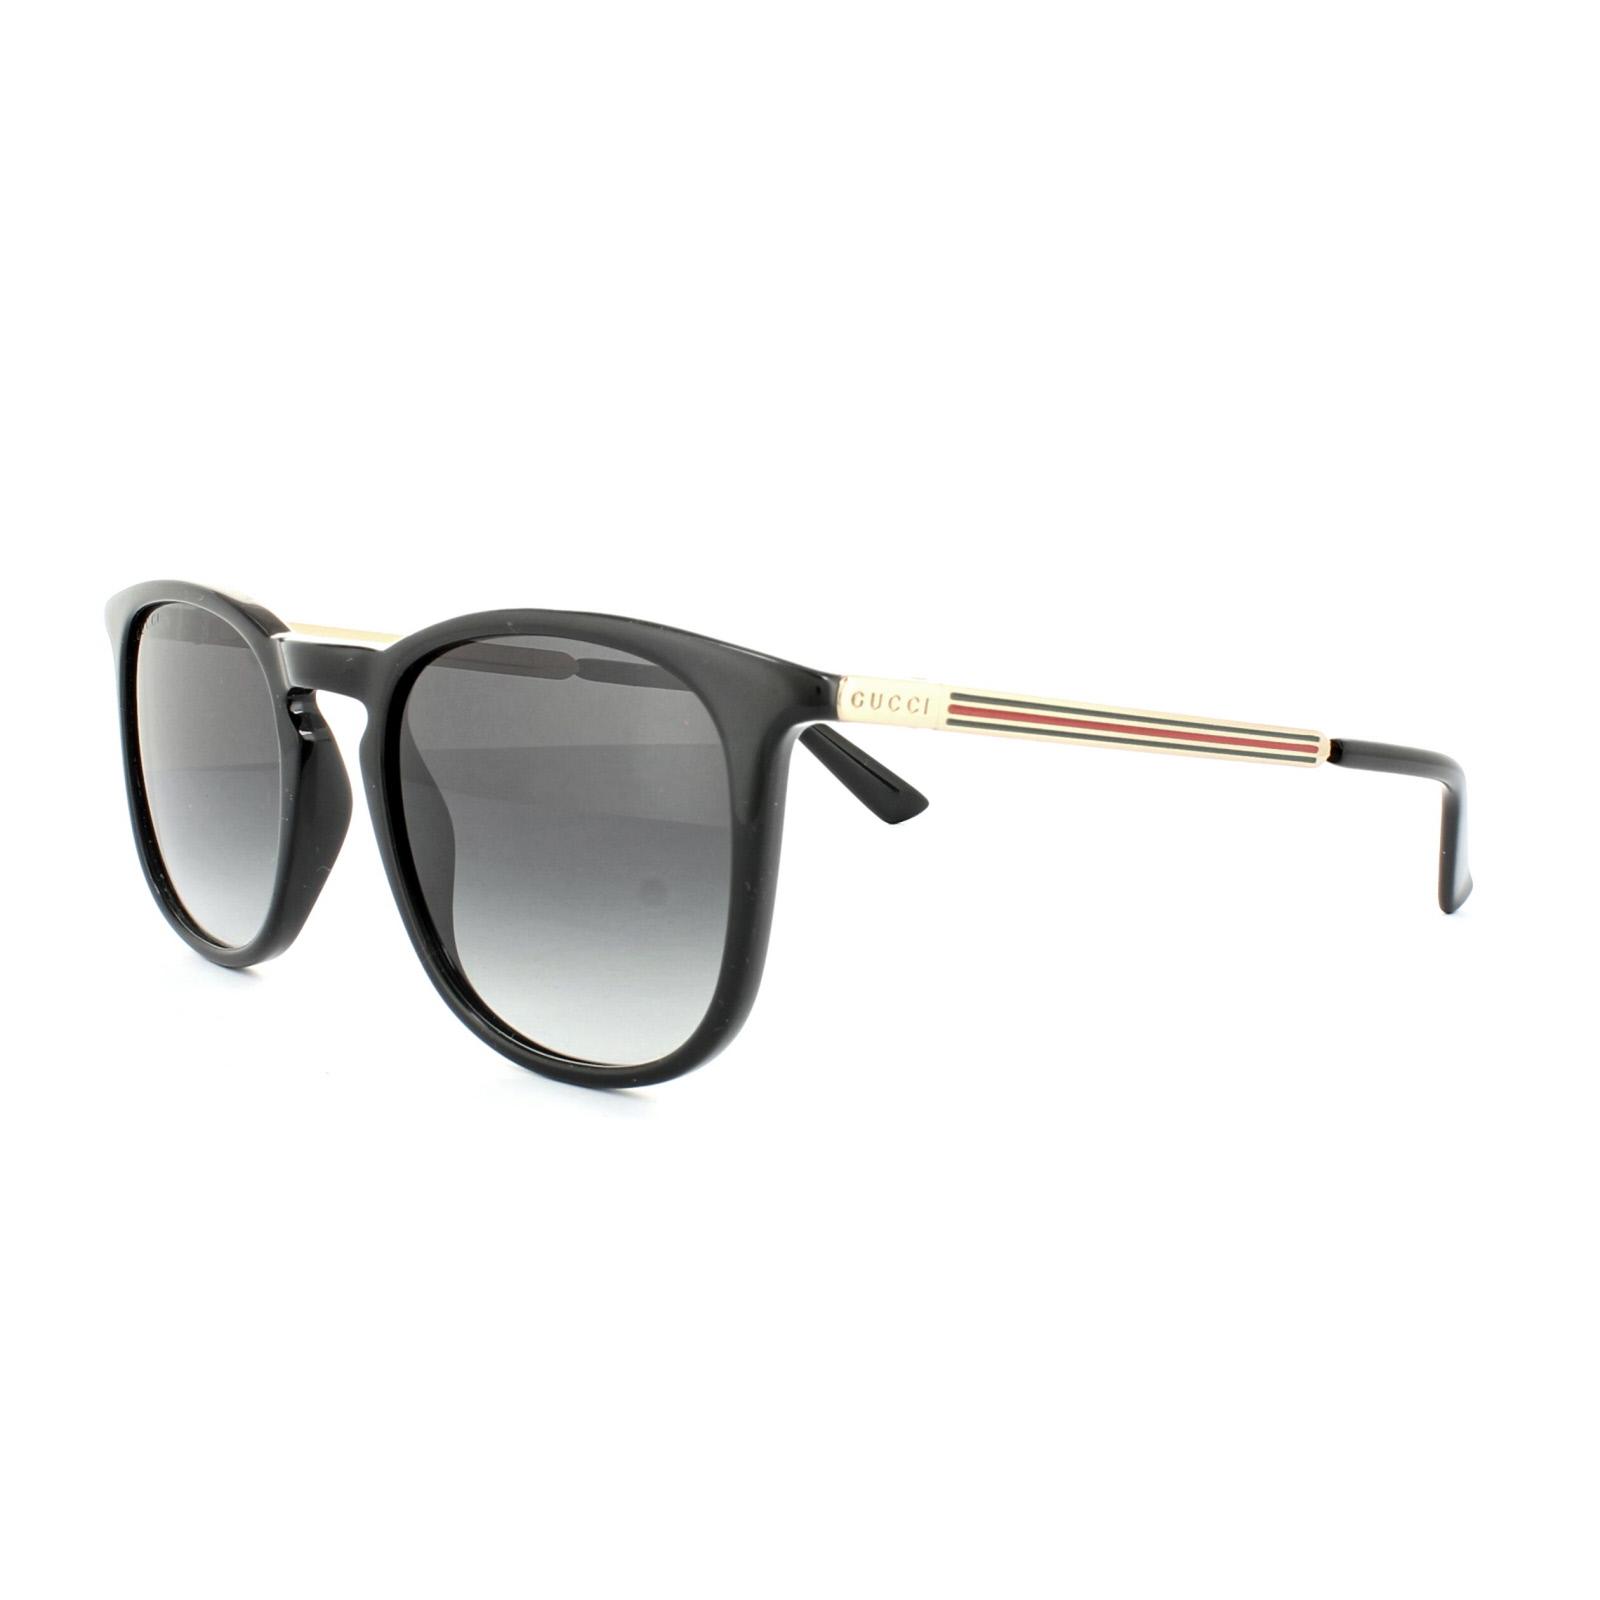 302dad7752a Cheap Gucci 1130 Sunglasses - Discounted Sunglasses